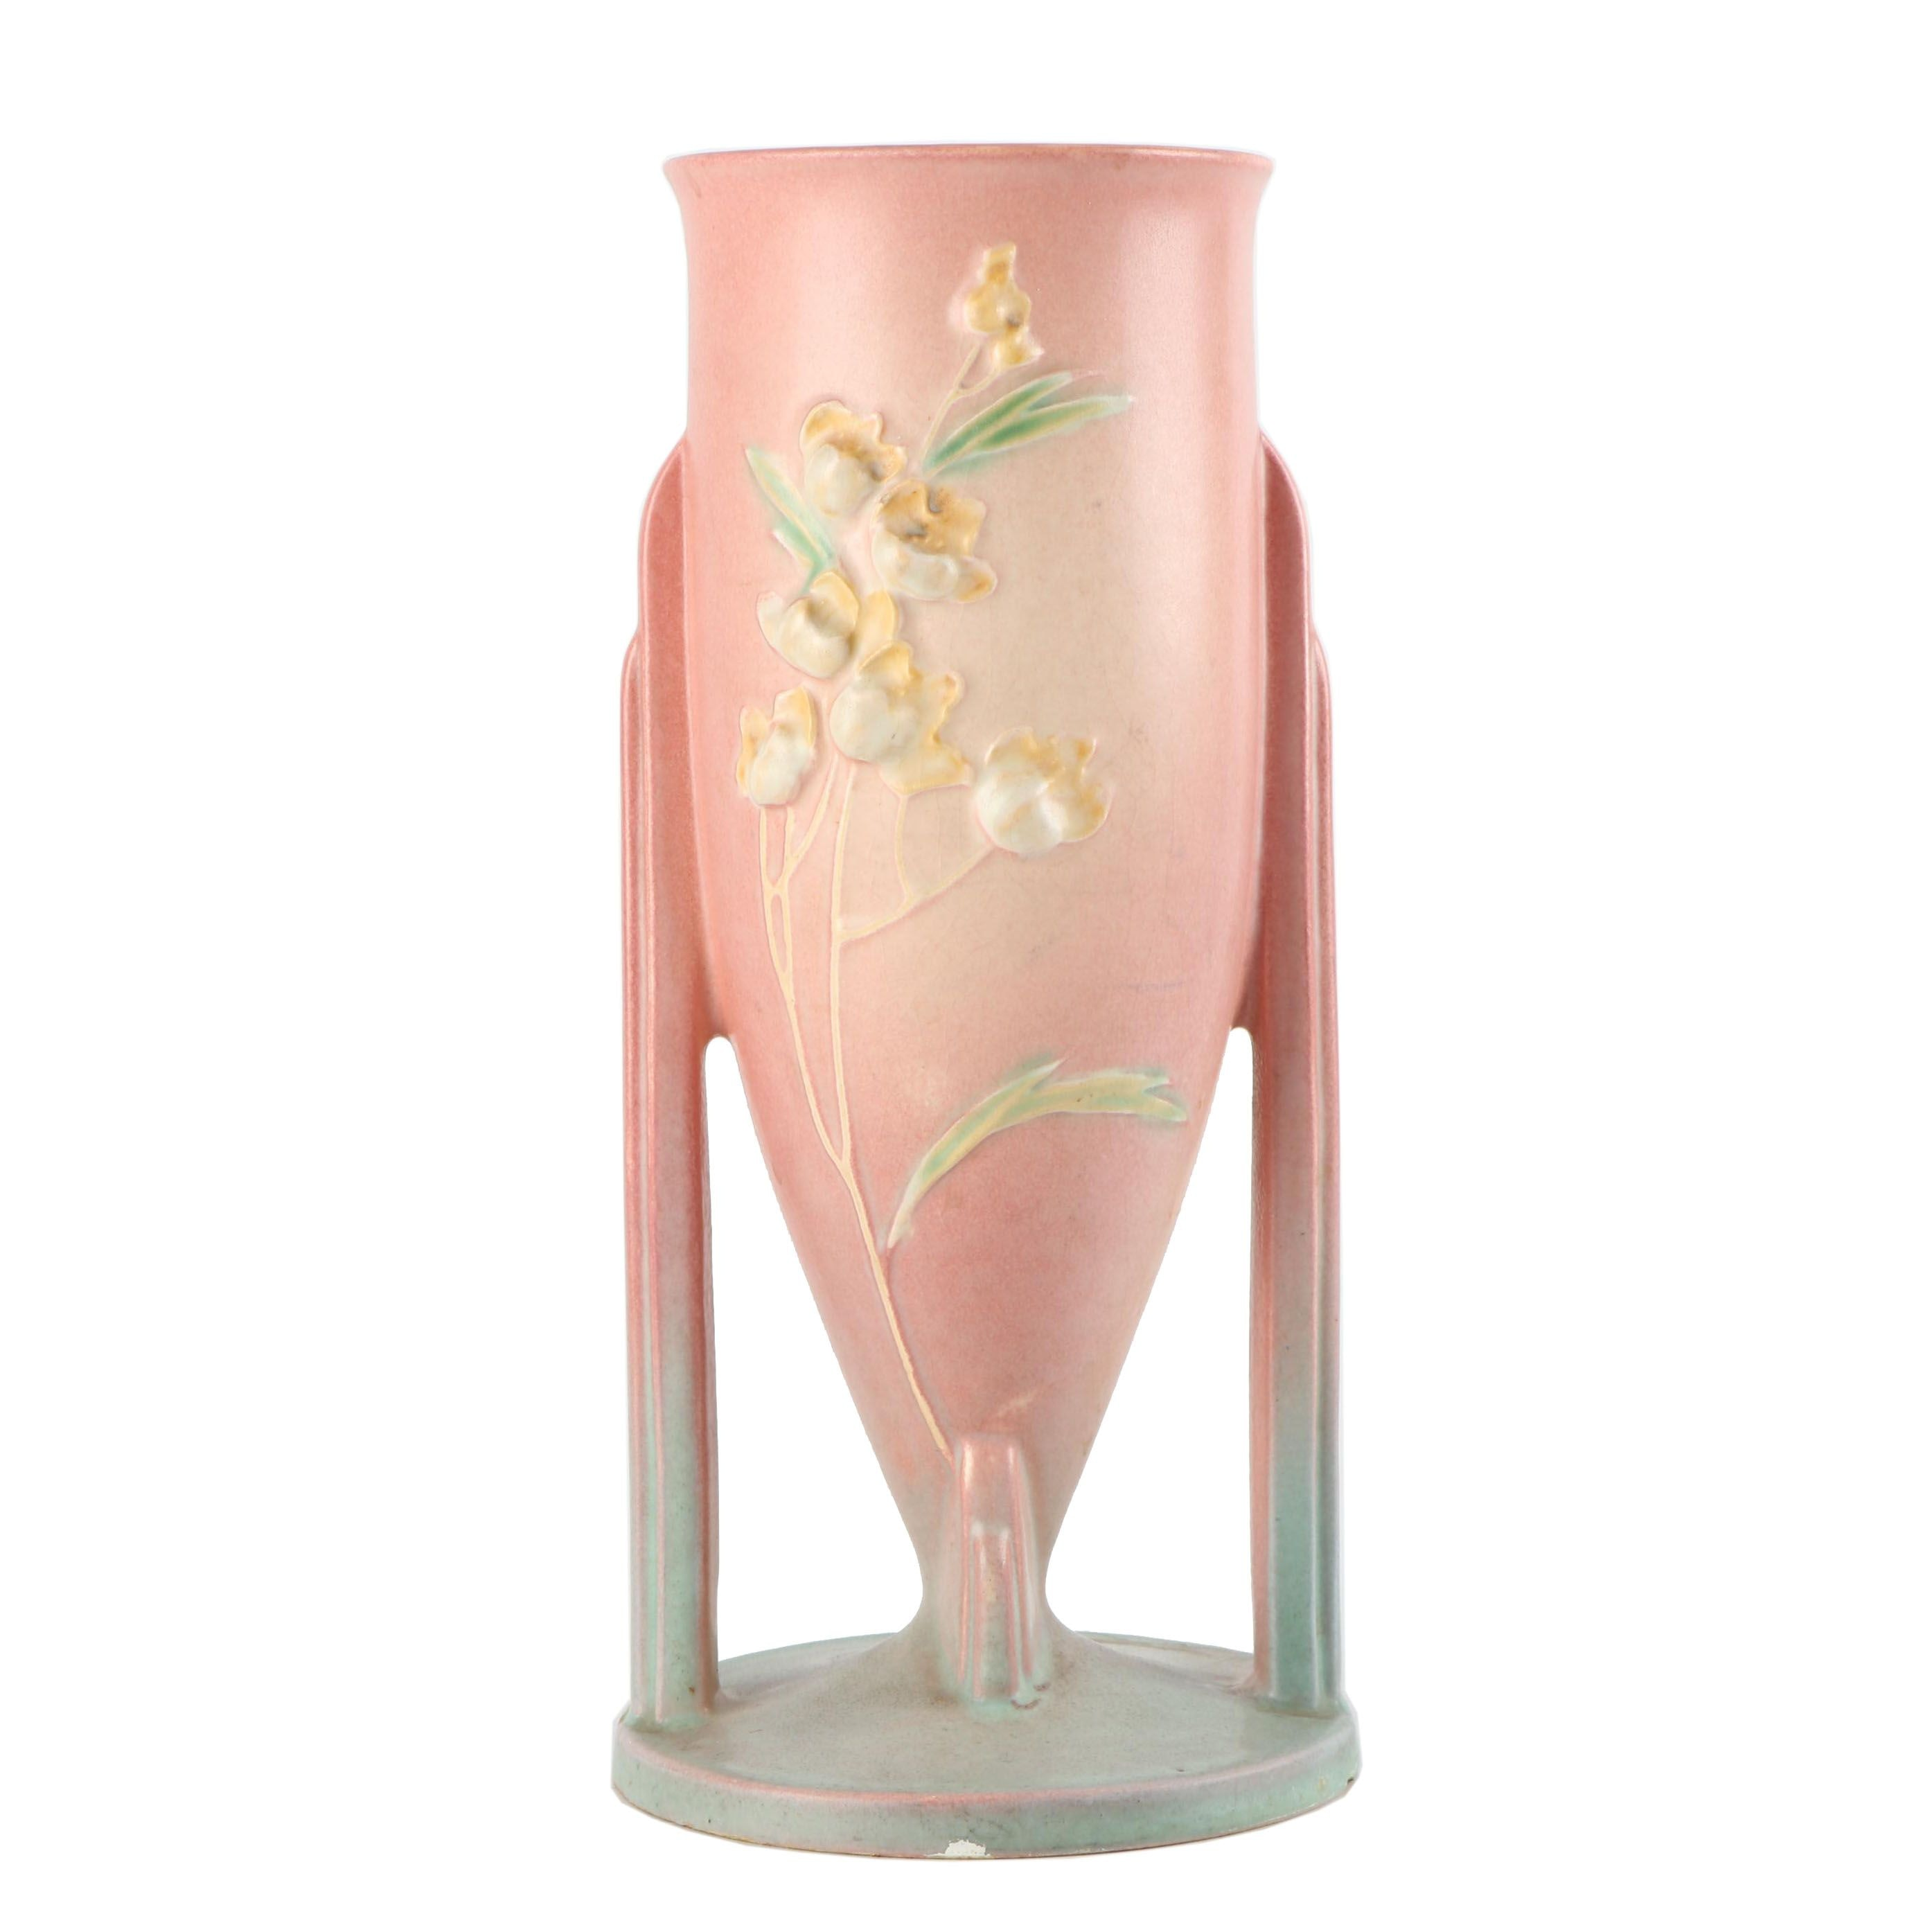 "Roseville Pottery ""Ixia"" Art Pottery Vase, 1930s"